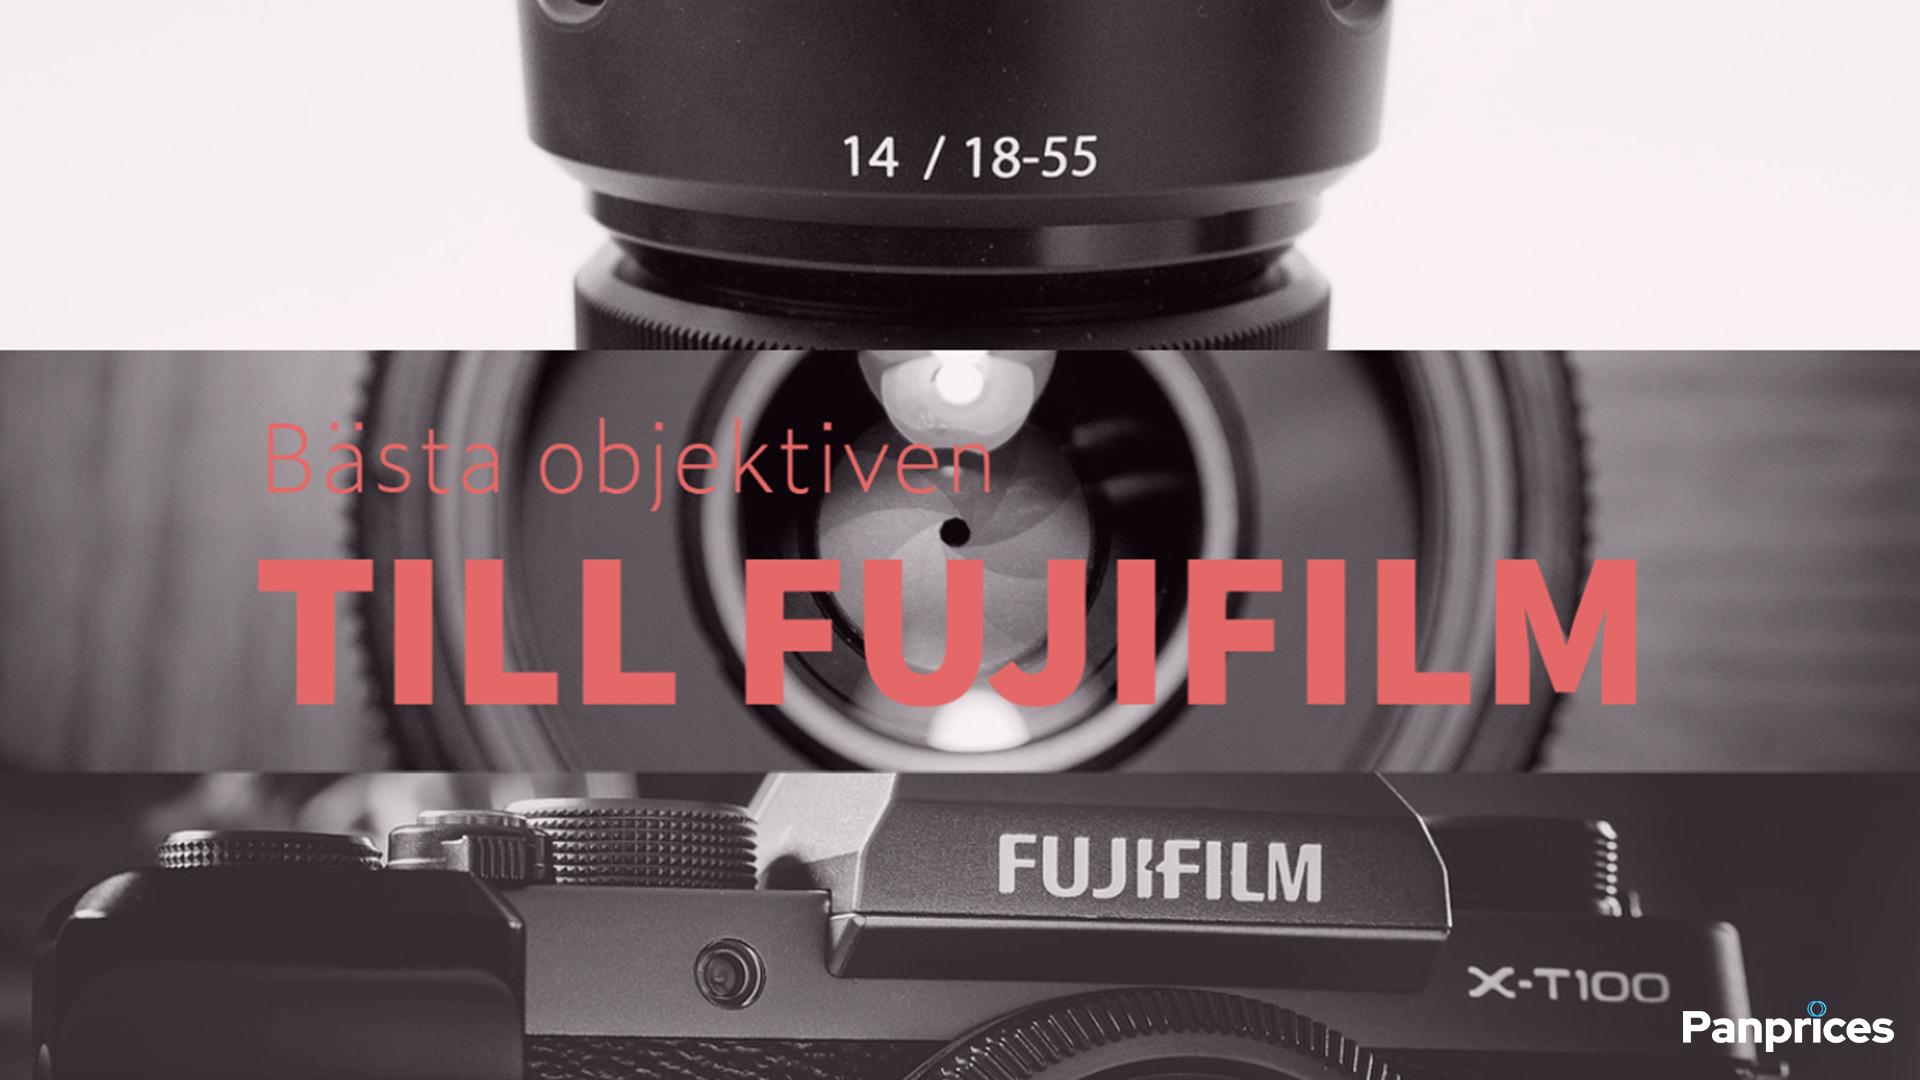 Objektiv till Fujifilmkameror